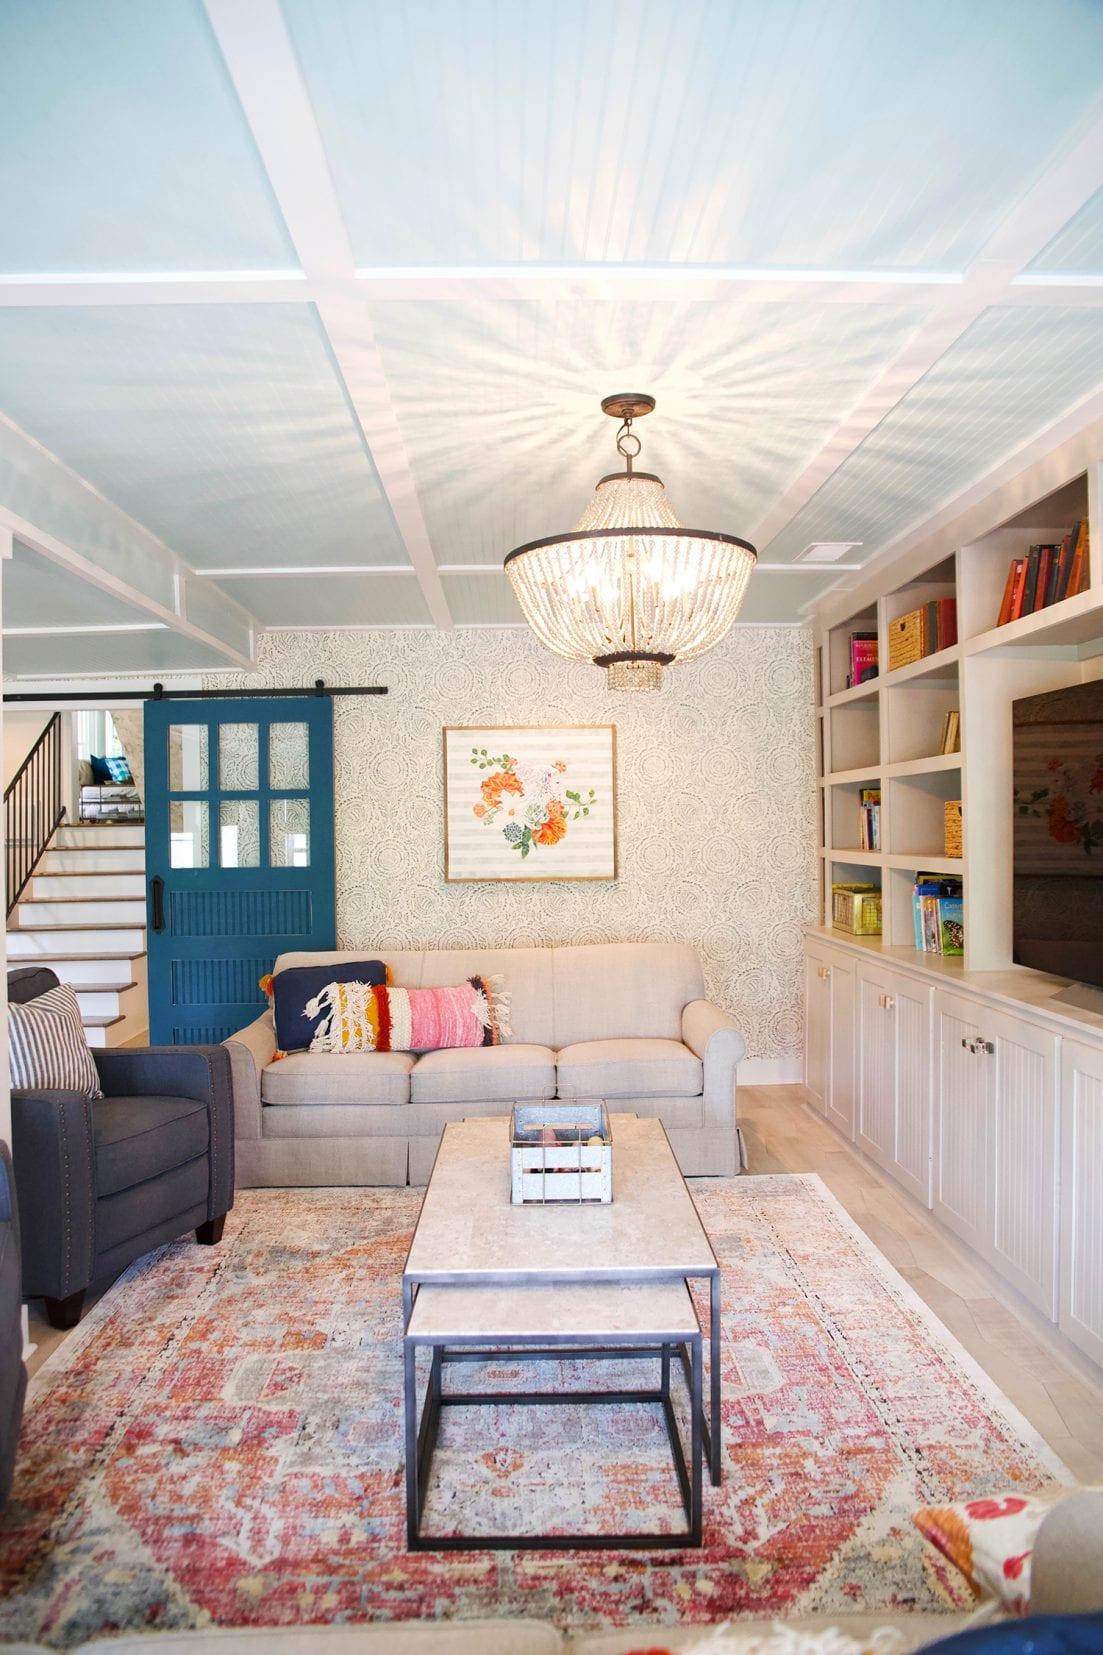 tips for a basement renovation - light